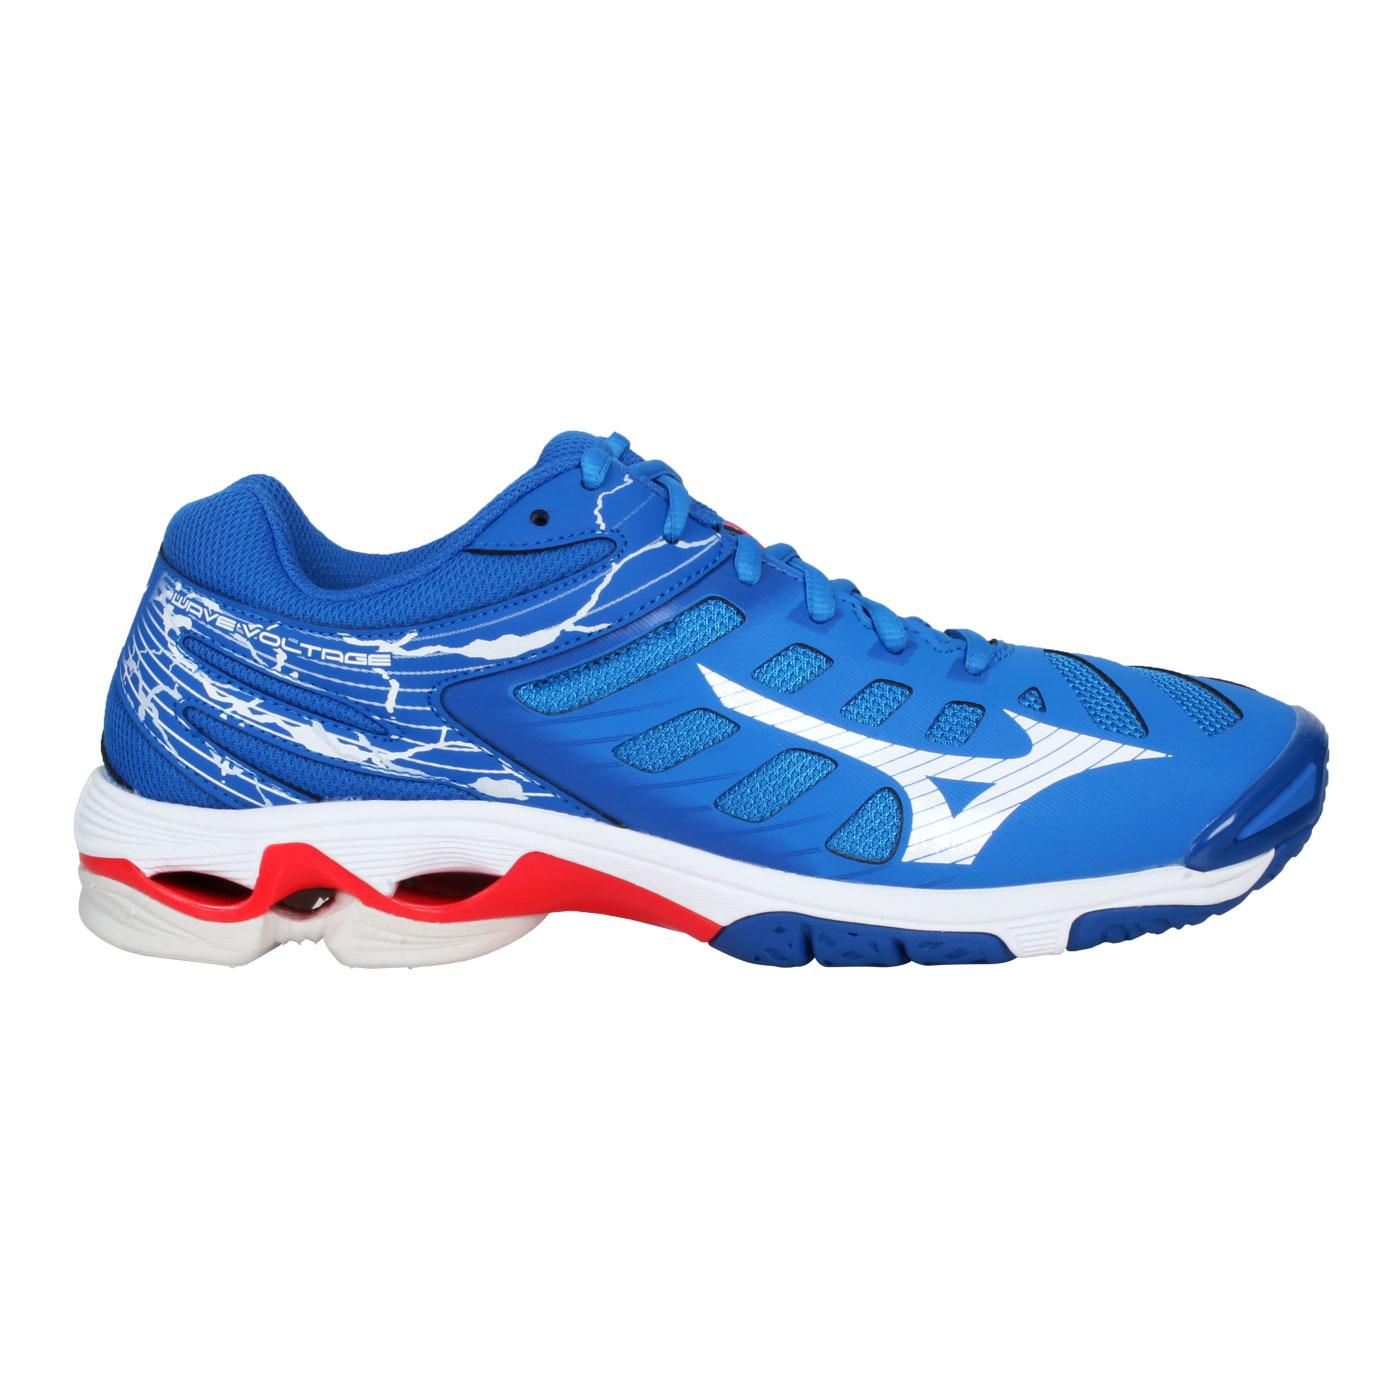 MIZUNO 男款排球鞋  @WAVE VOLTAGE@V1GA216024 - 藍白紅